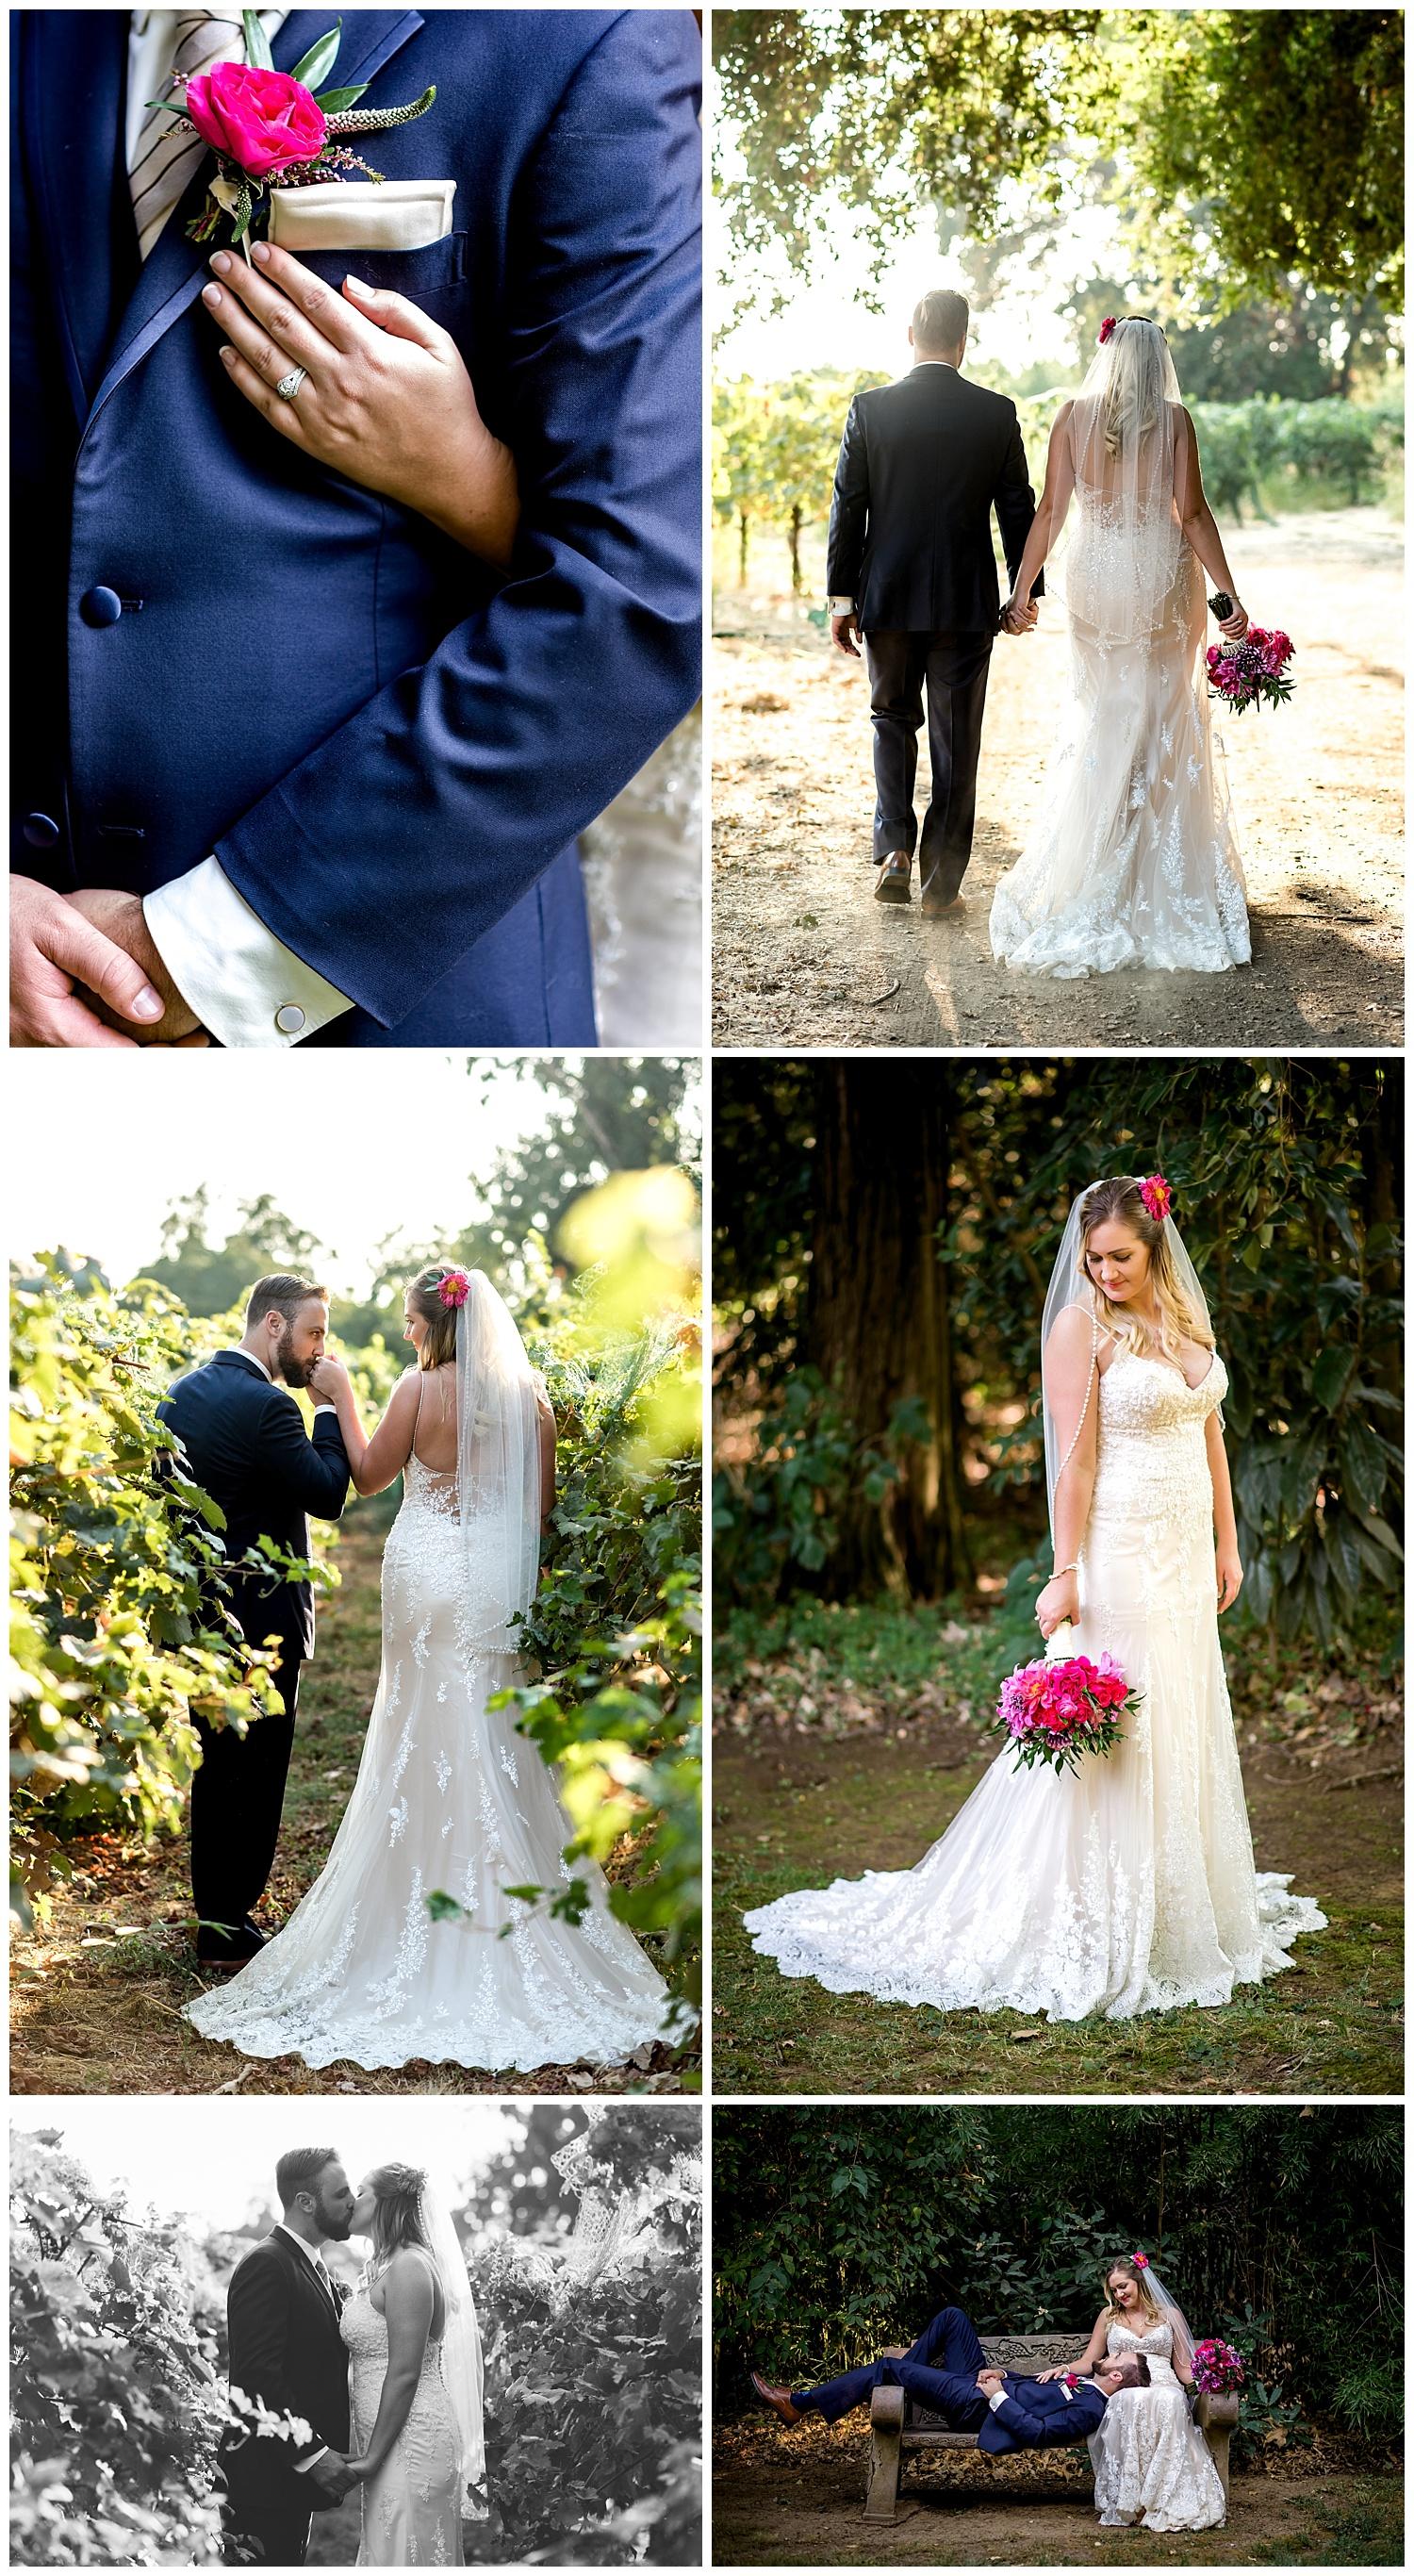 the-530-bride_chico-wedding-planner_gale-vineyards